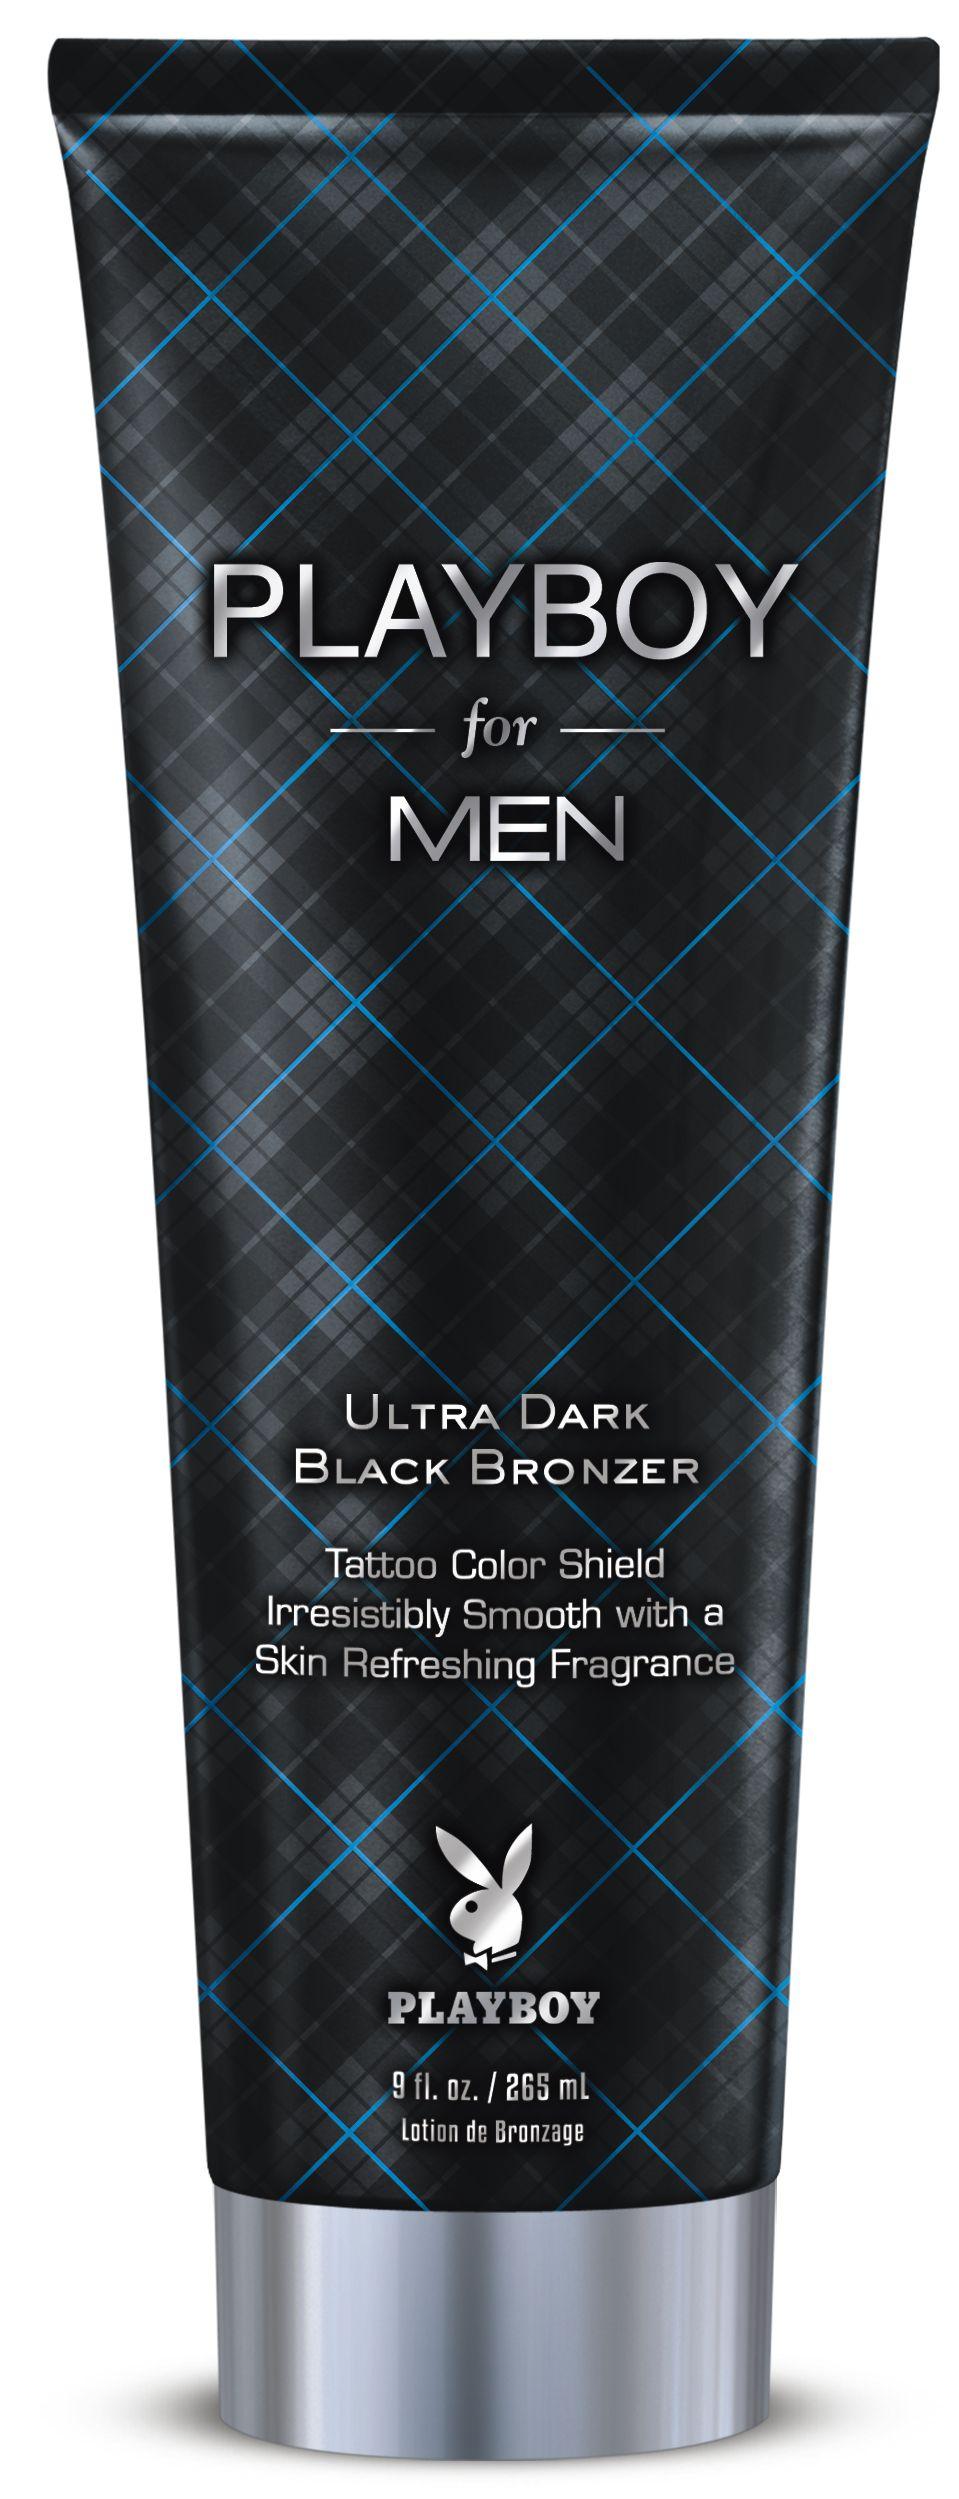 Playboy™ for Men Ultra Dark Black Bronzer